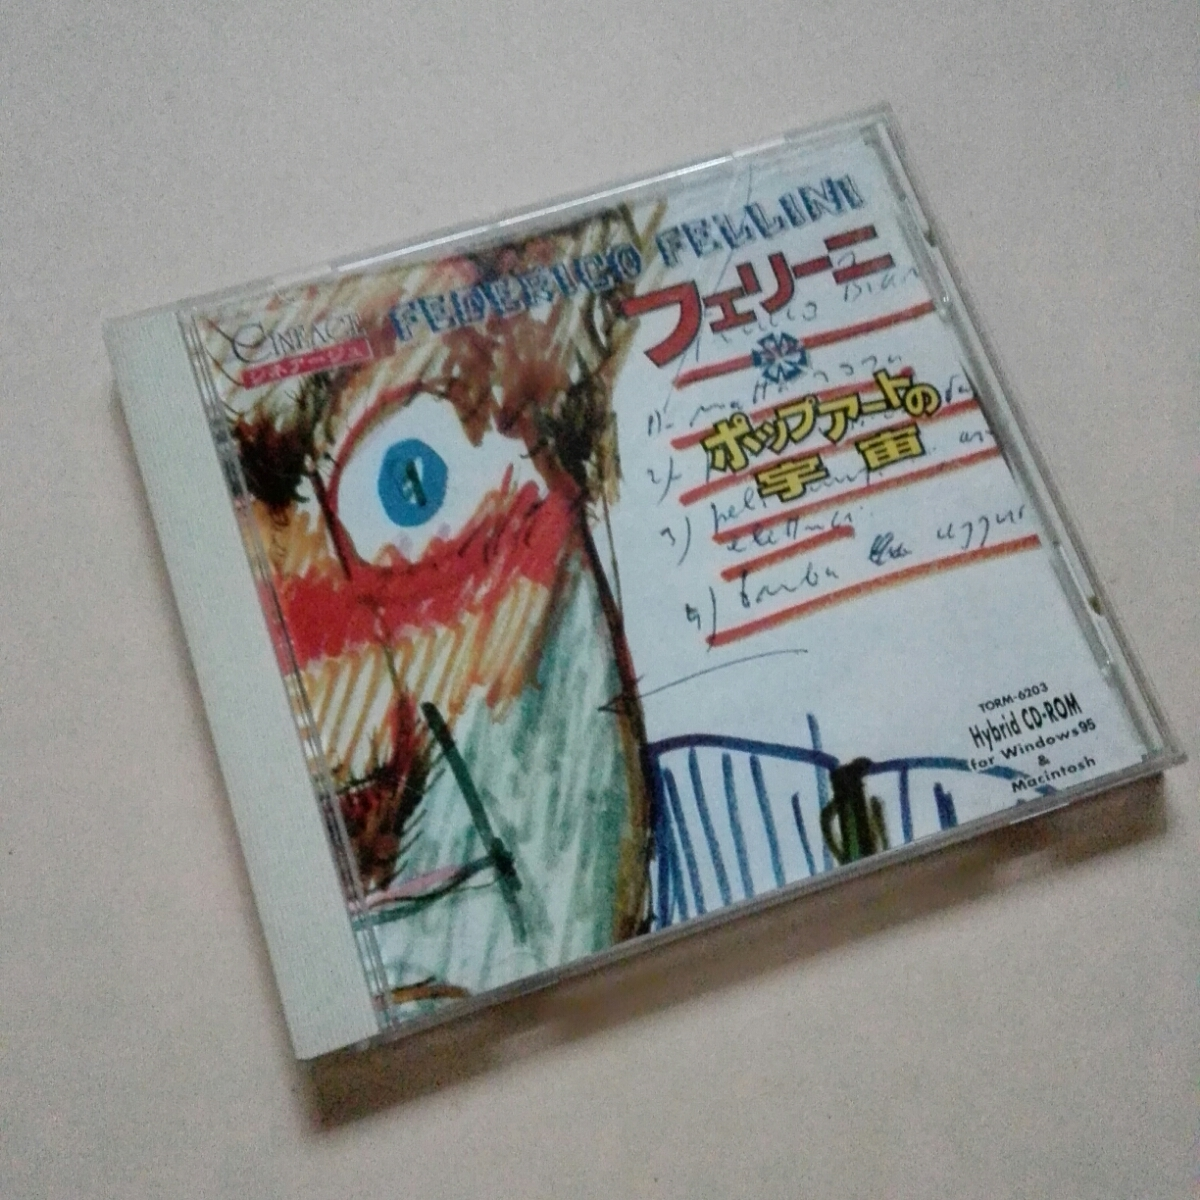 sinea-jufete Rico Ferrie niCD-ROM pop art  cosmos hybrid